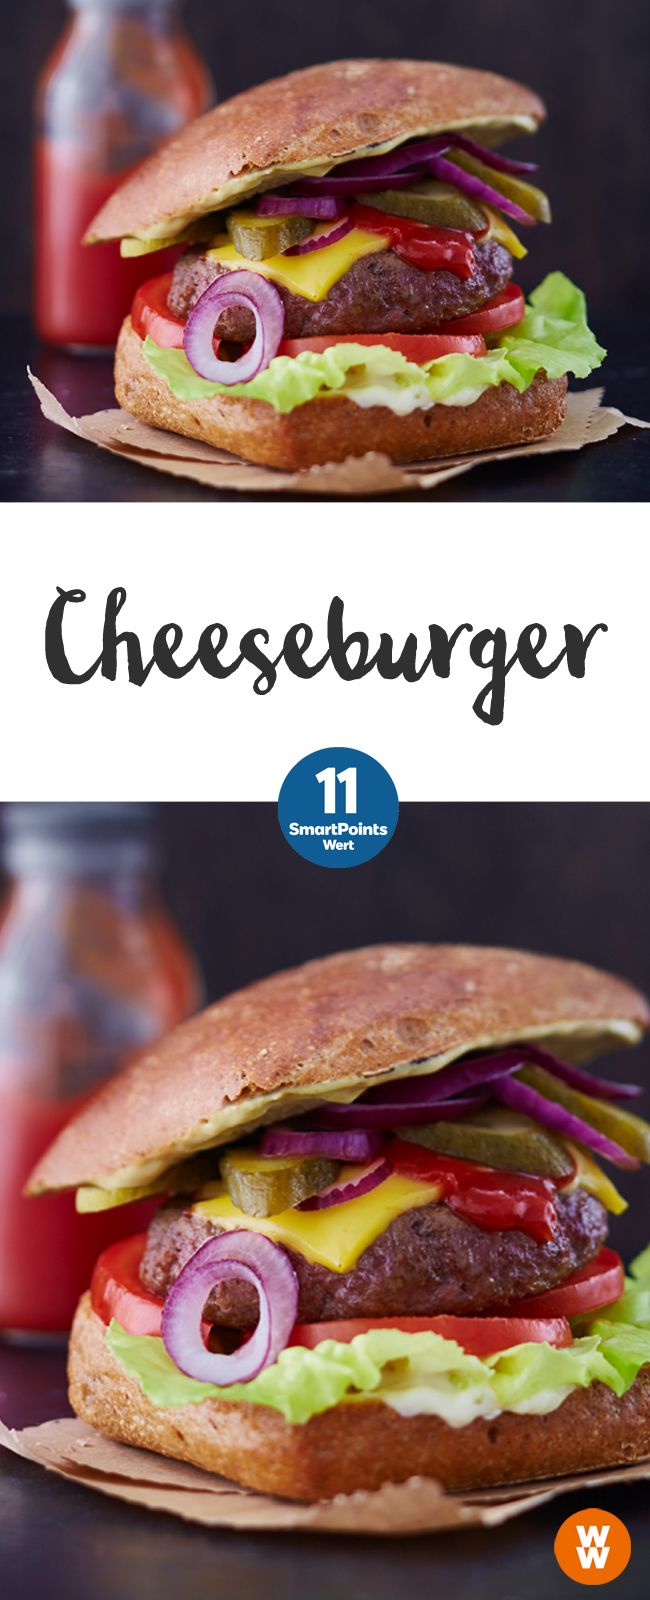 Cheeseburger, Burger, Grillen, Barbecue | Weight Watchers